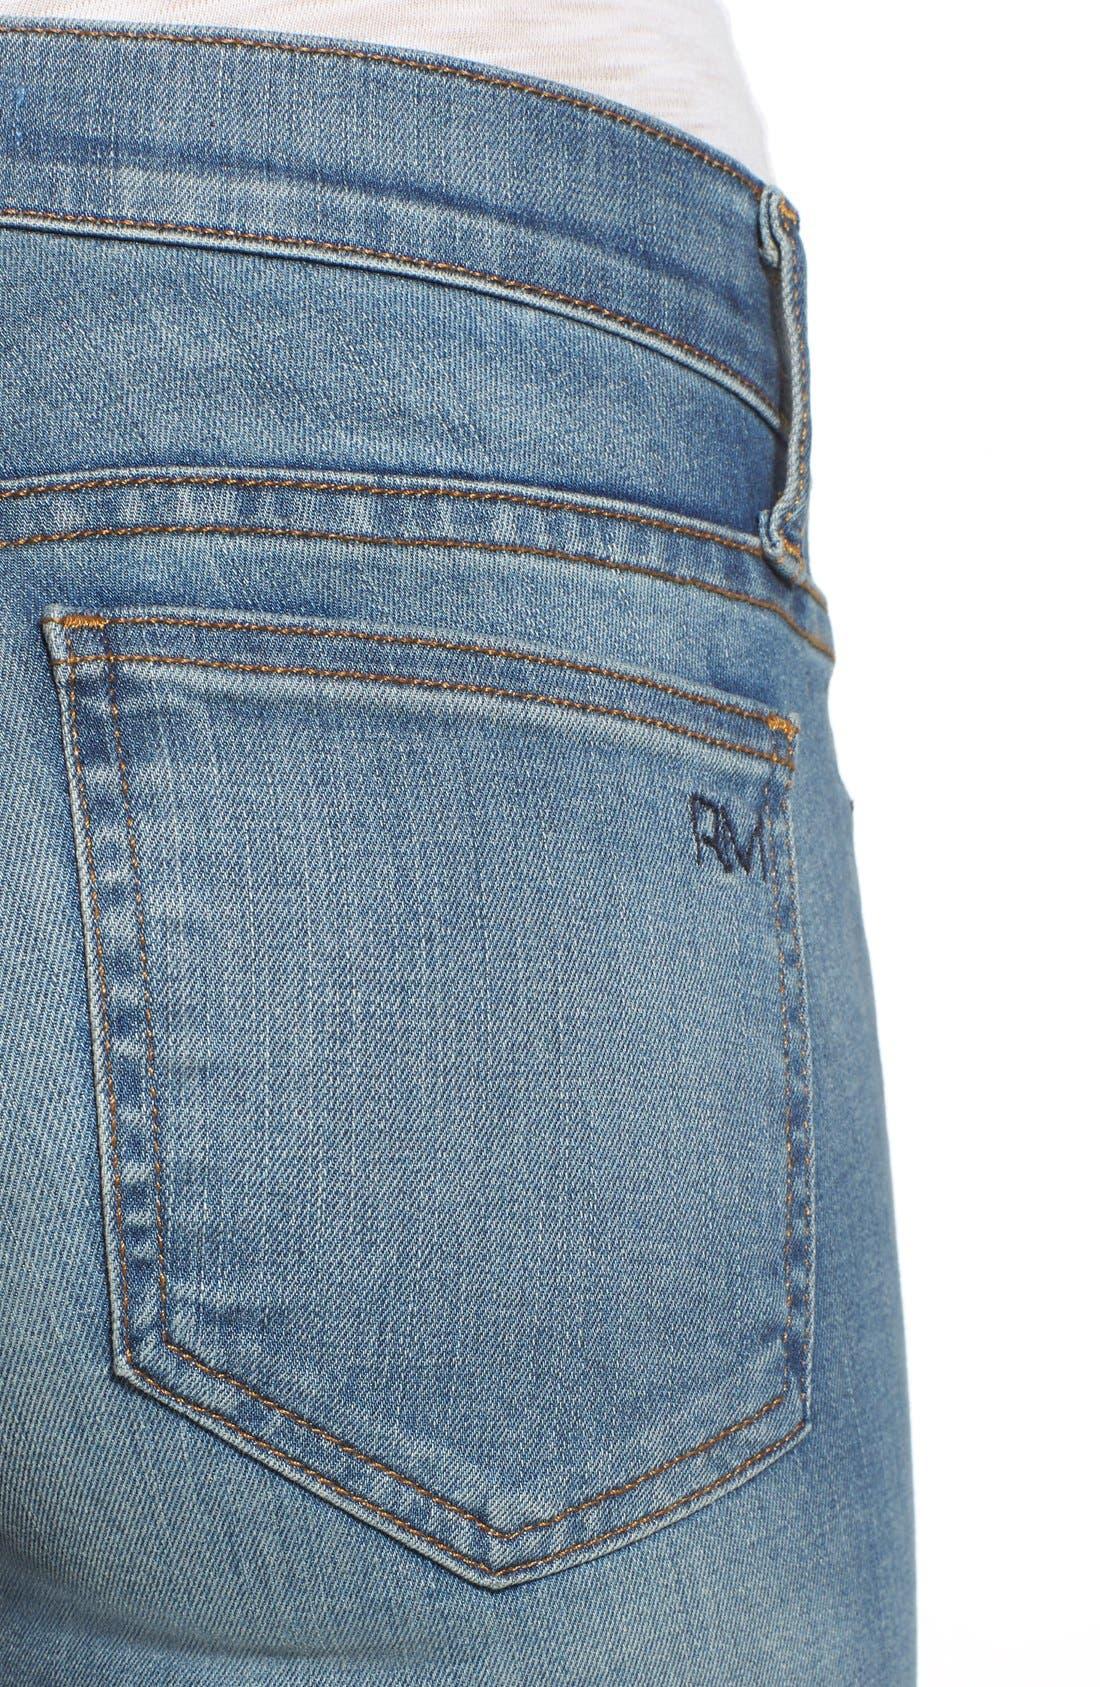 REBECCA MINKOFF, 'Jane' Skinny Jeans, Alternate thumbnail 5, color, 400